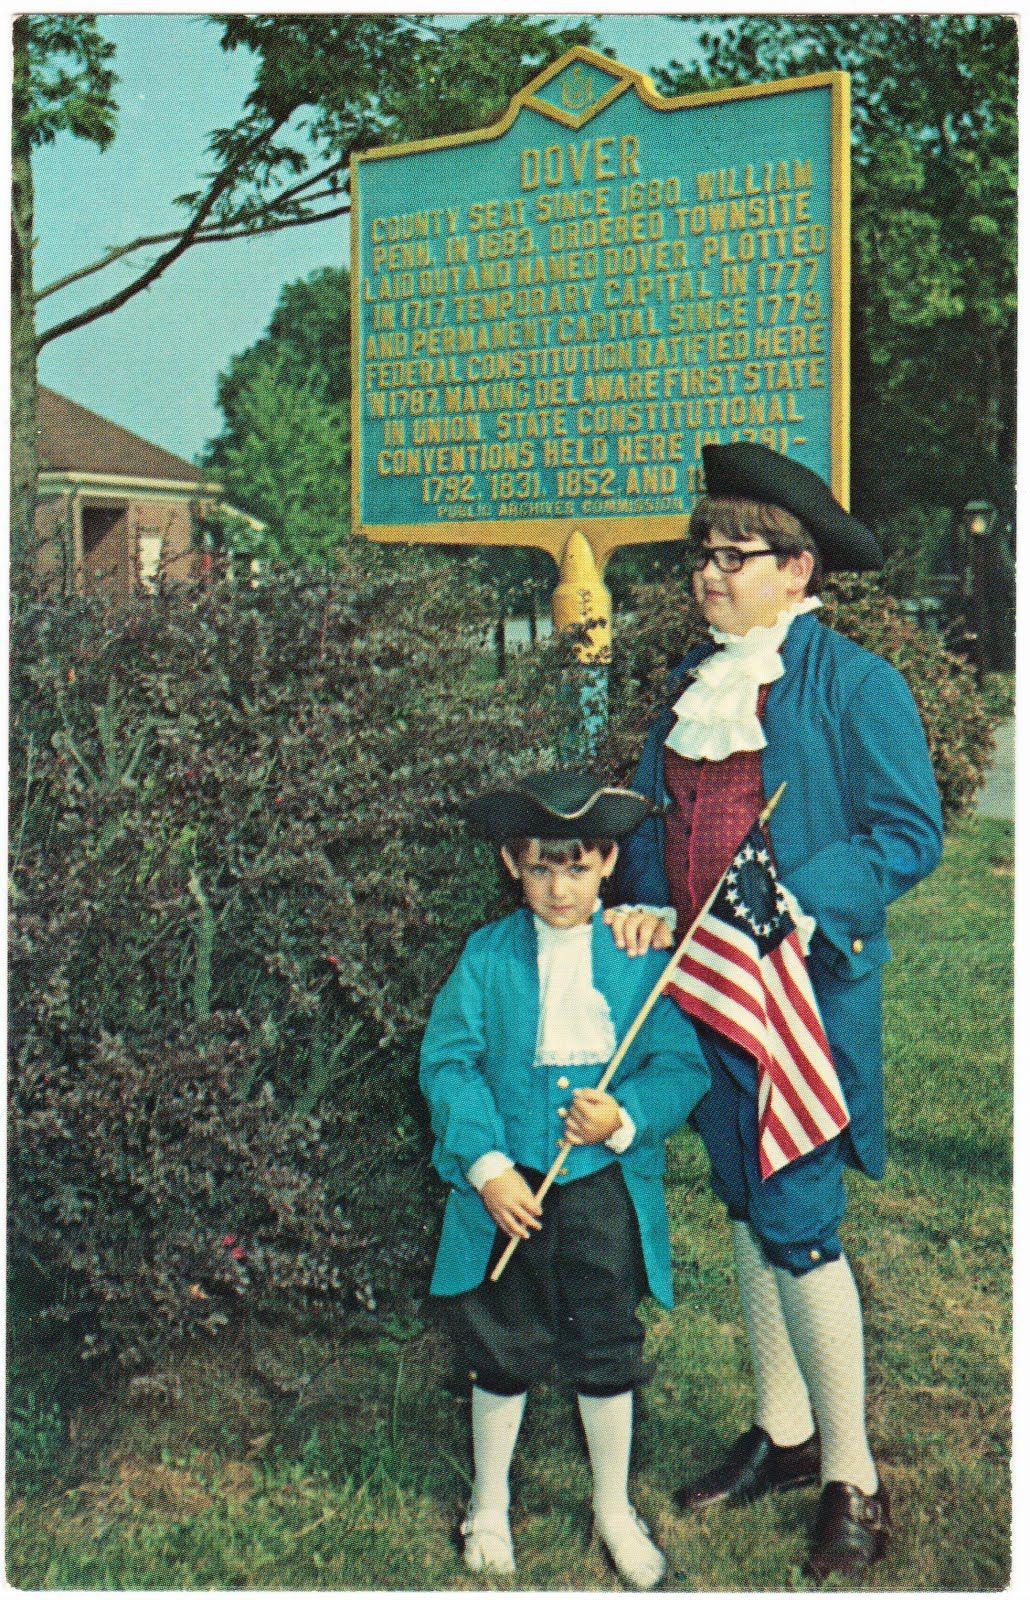 Postcard: HISTORIC DOVER MARKER at Entrance to Blue Coat Inn 800 N. State St., Dover, Delaware